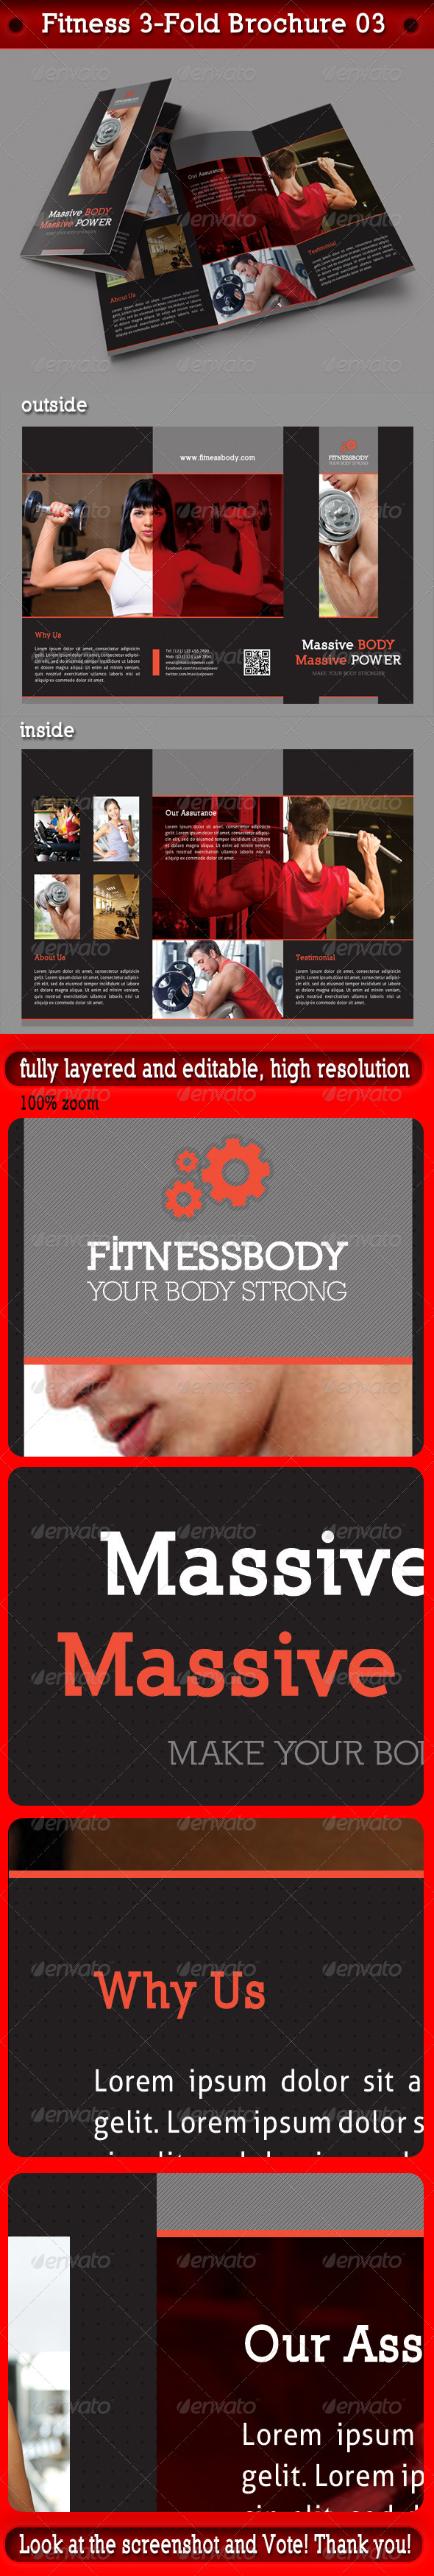 Fitness 3-Fold Brochure 03 - Informational Brochures